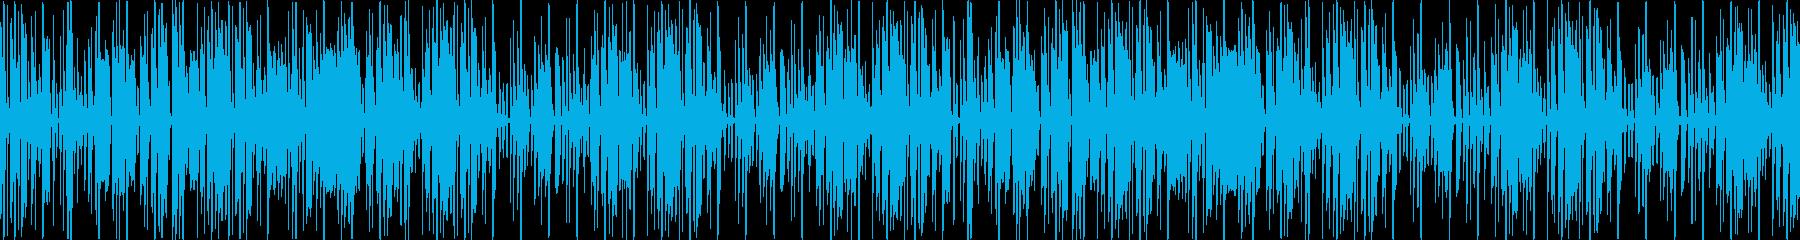 Loop - デジタル/サイバー/侵入の再生済みの波形